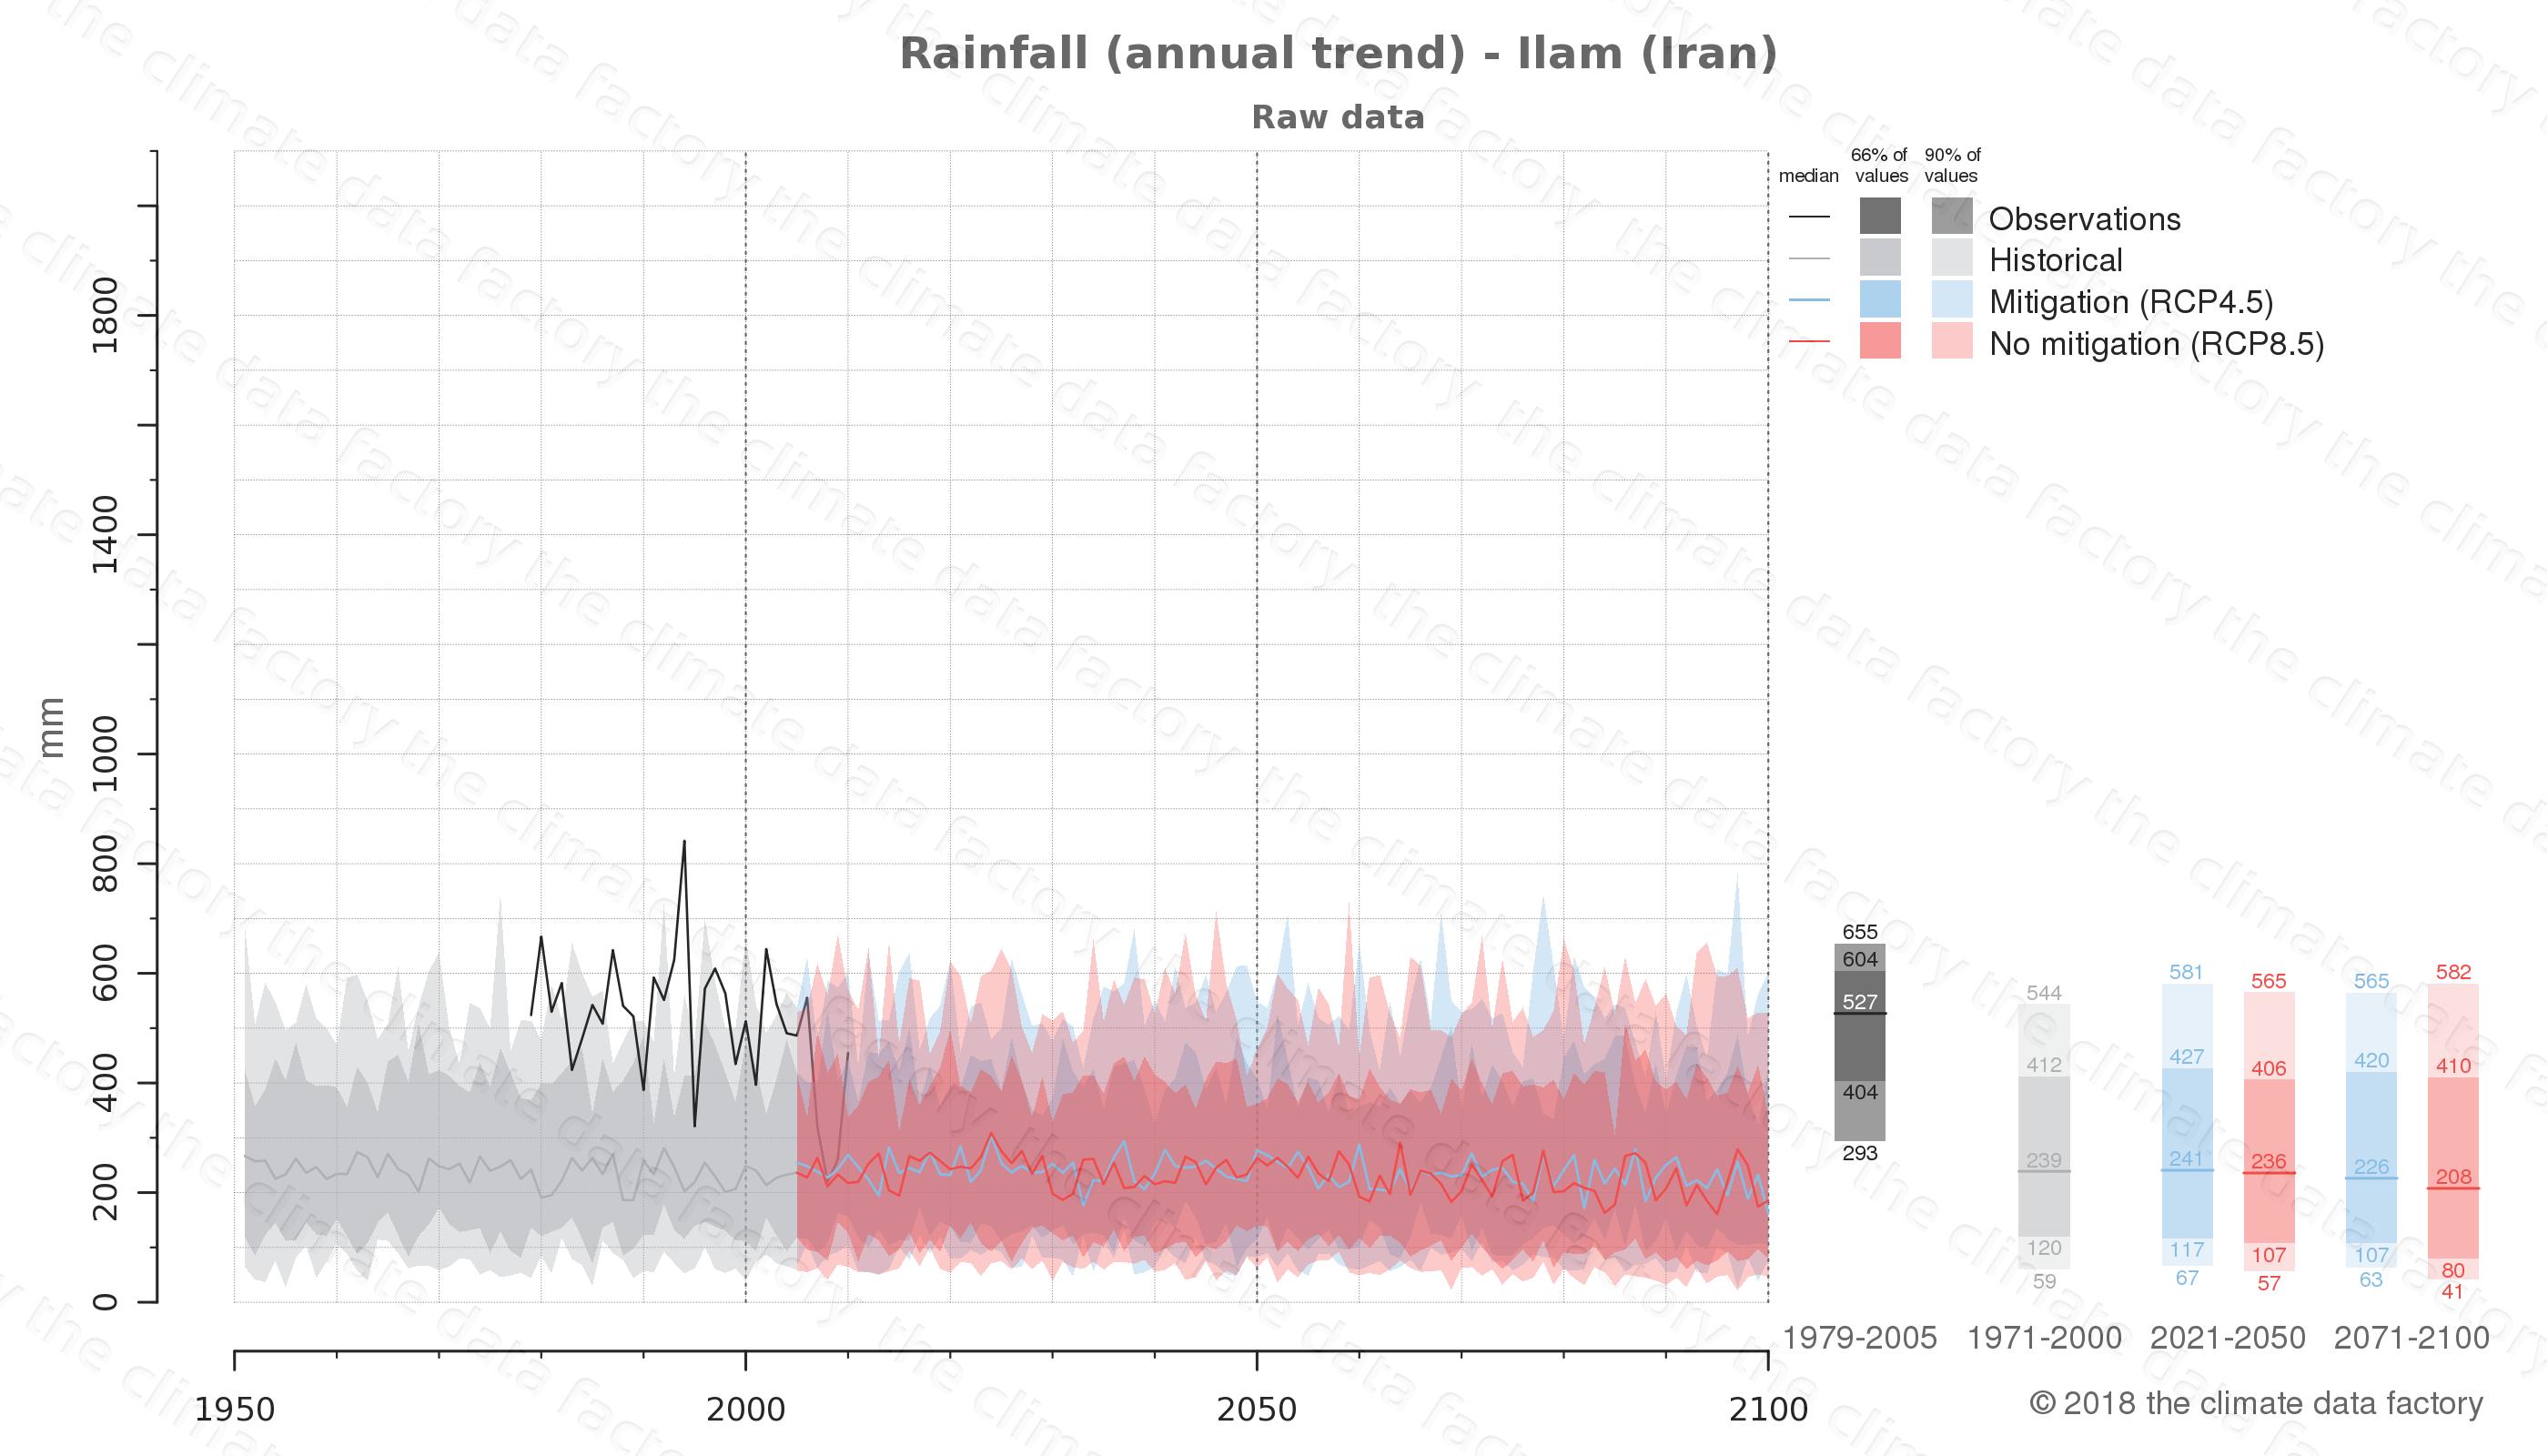 climate change data policy adaptation climate graph city data rainfall ilam iran